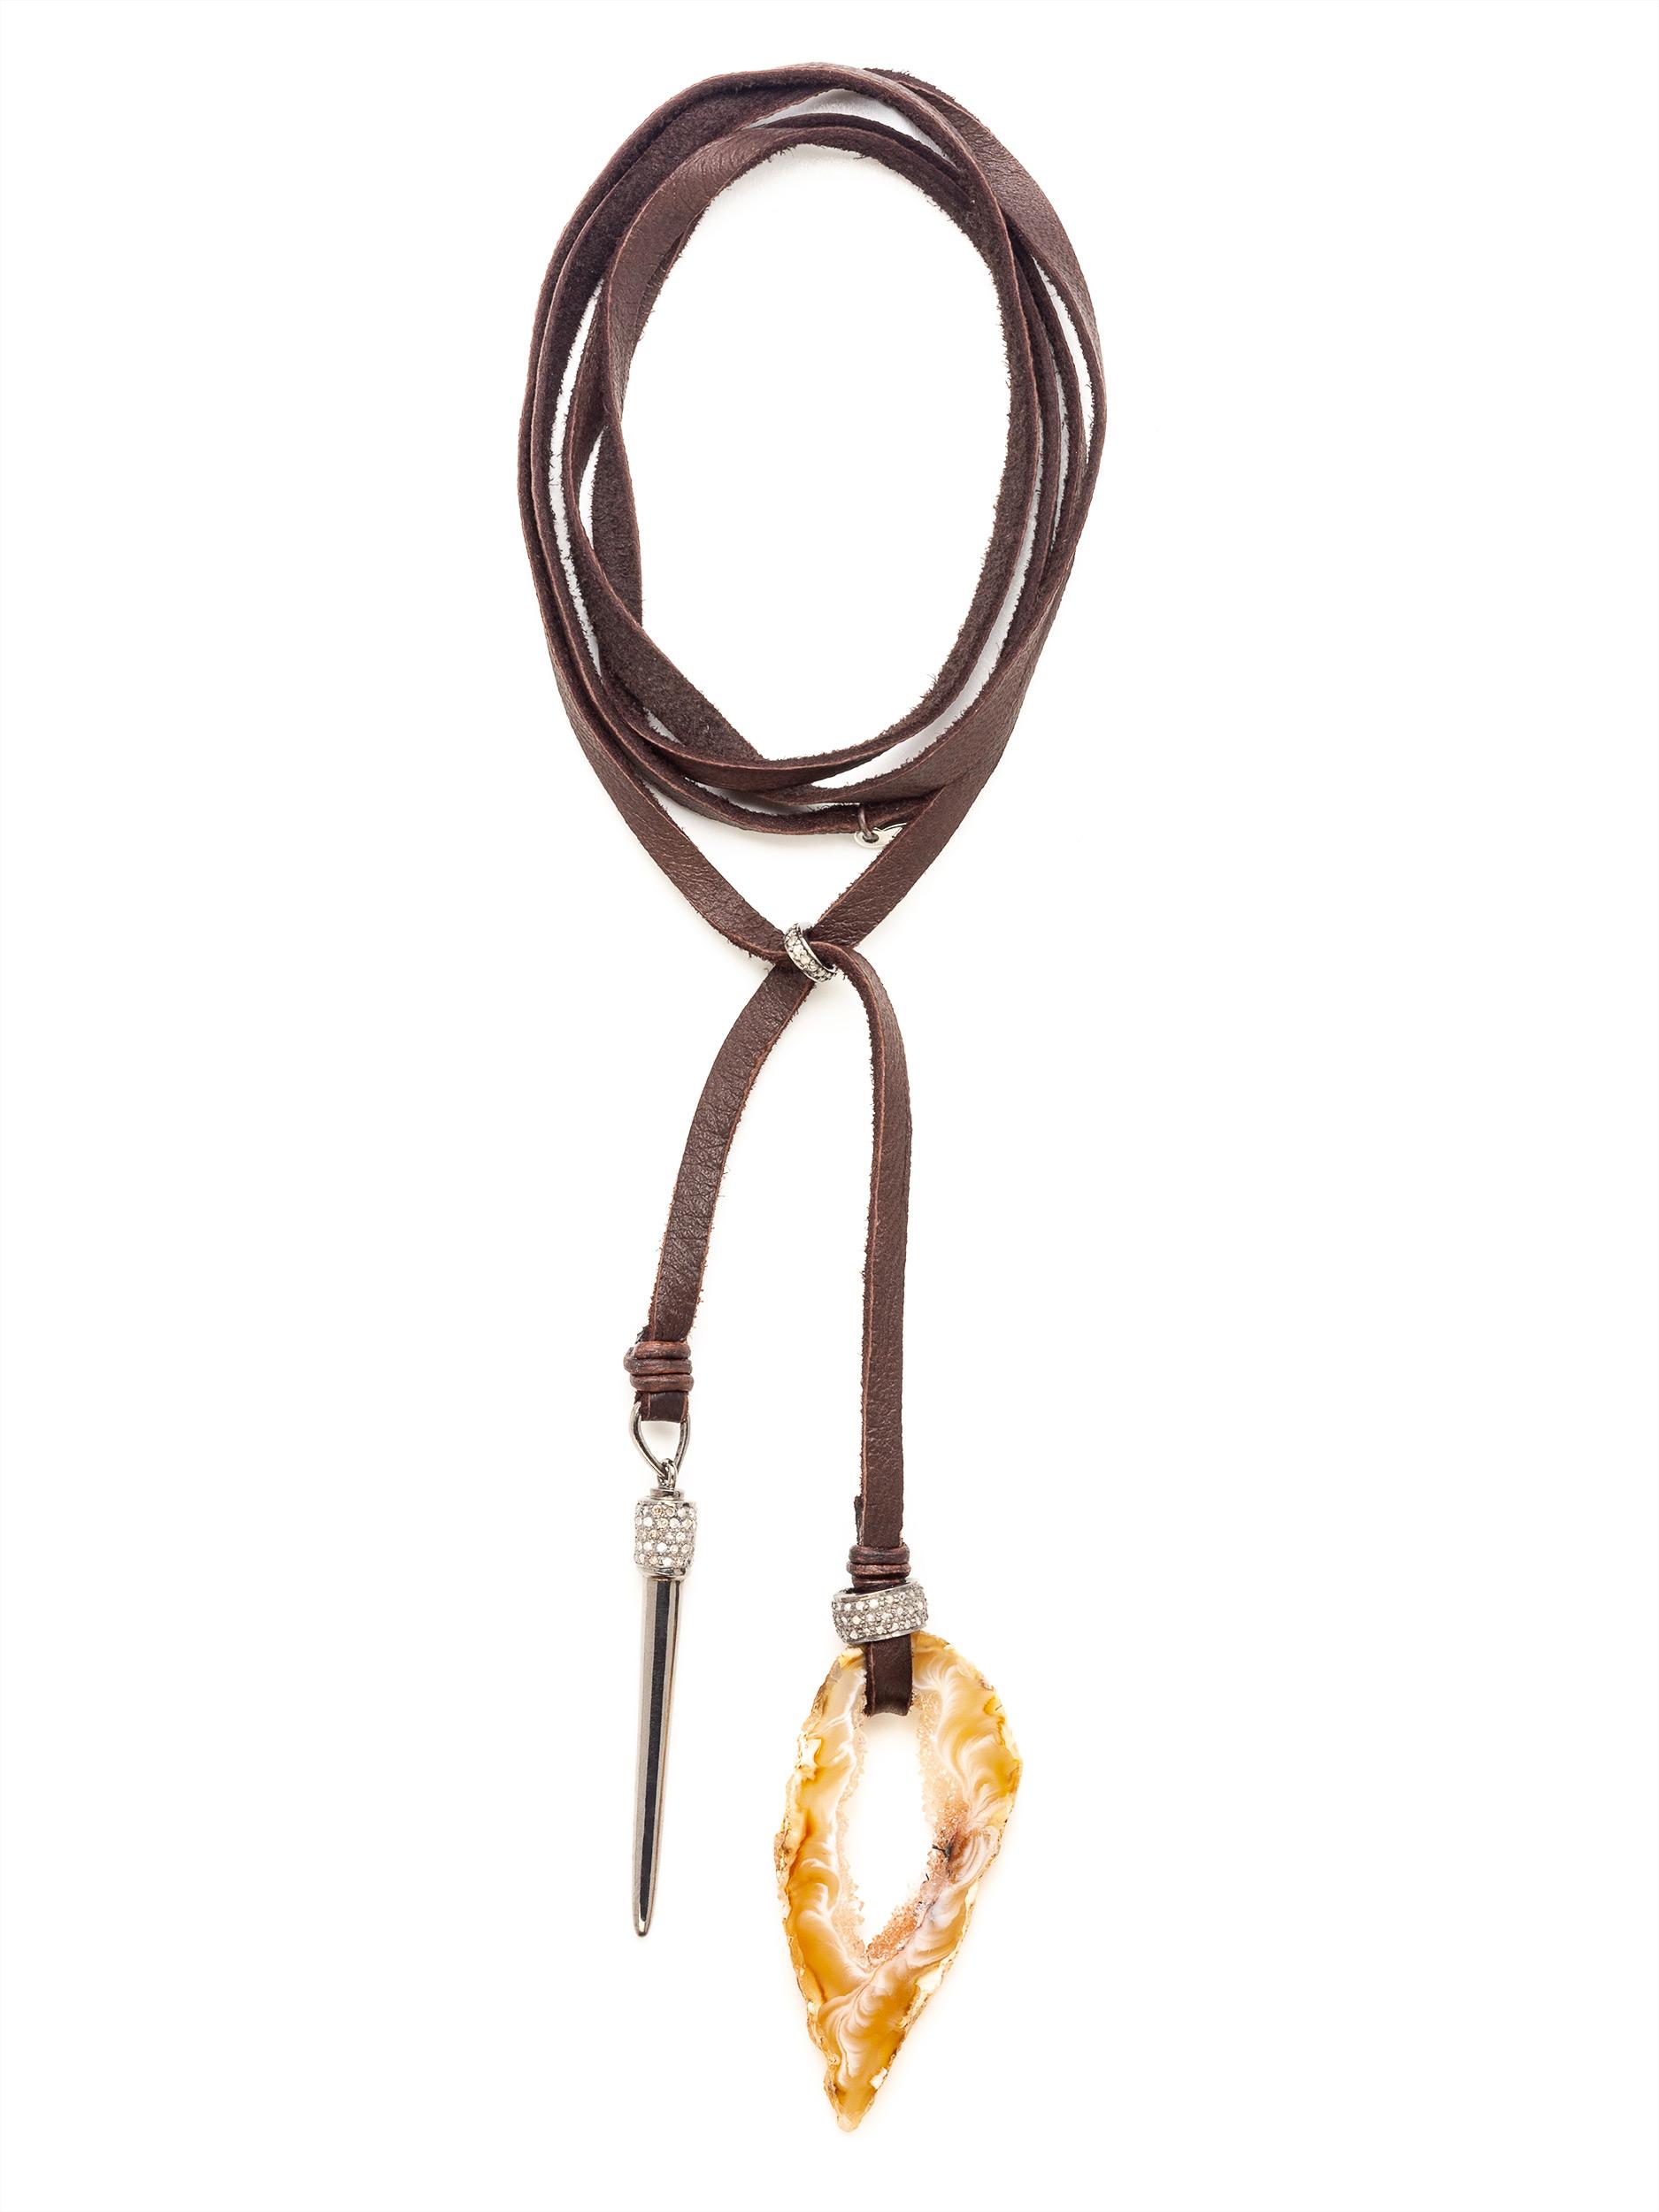 Sliced Geode Pave Diamond Leather Deerskin Necklace